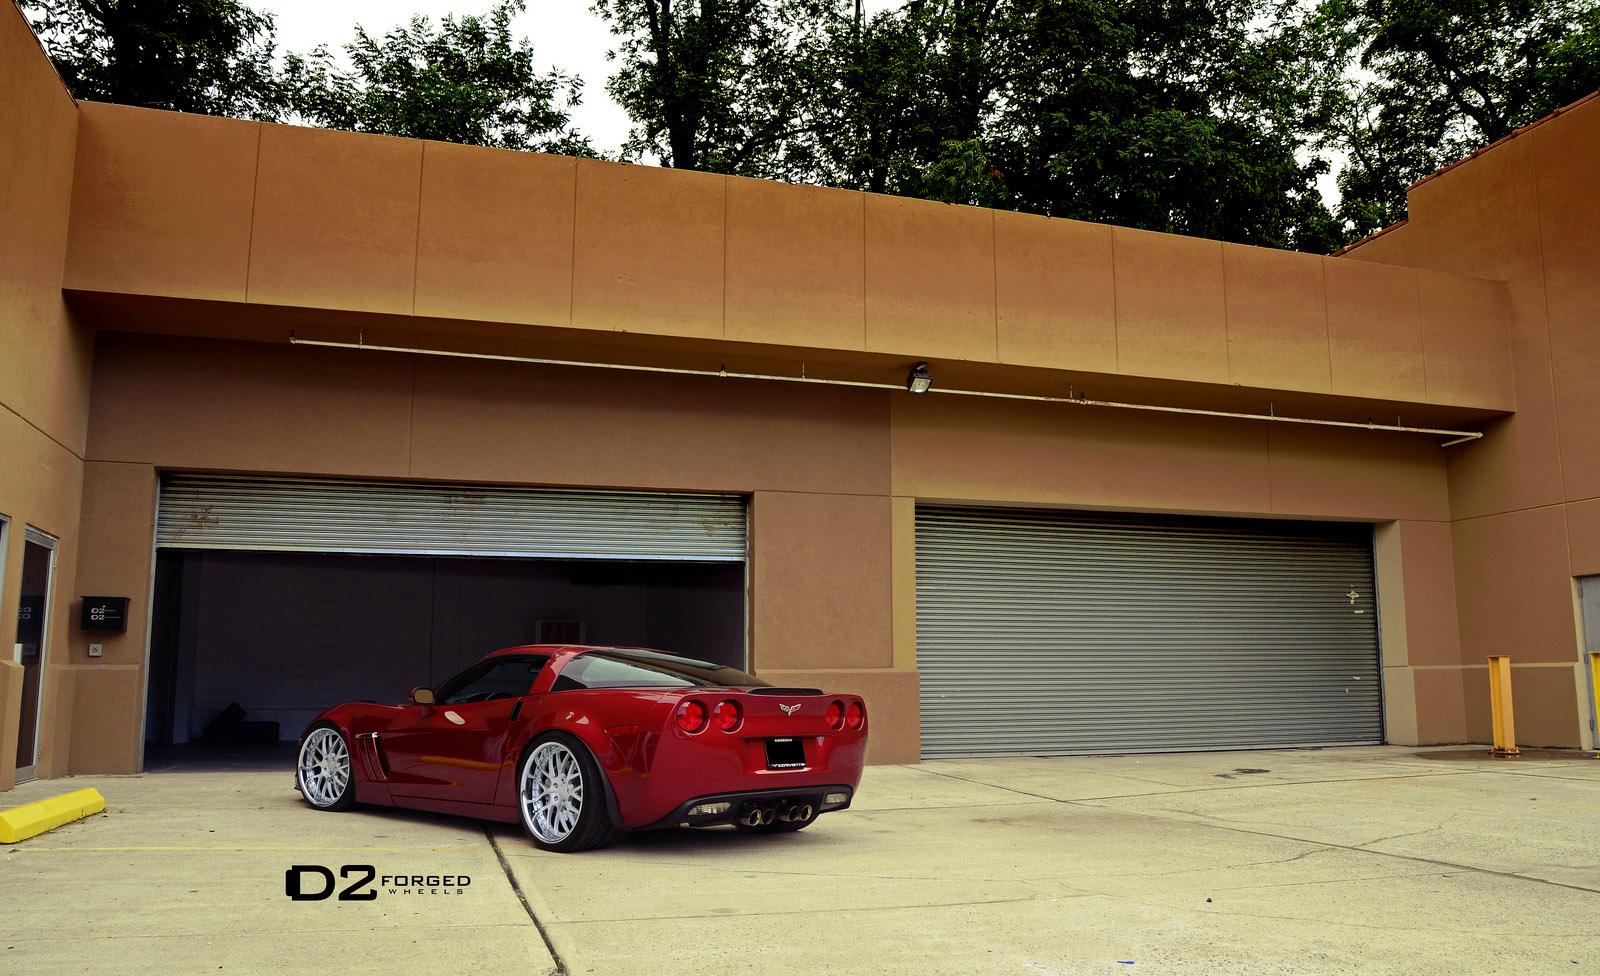 D2FORGED Chevrolet Corvette Grand Sport photo #8